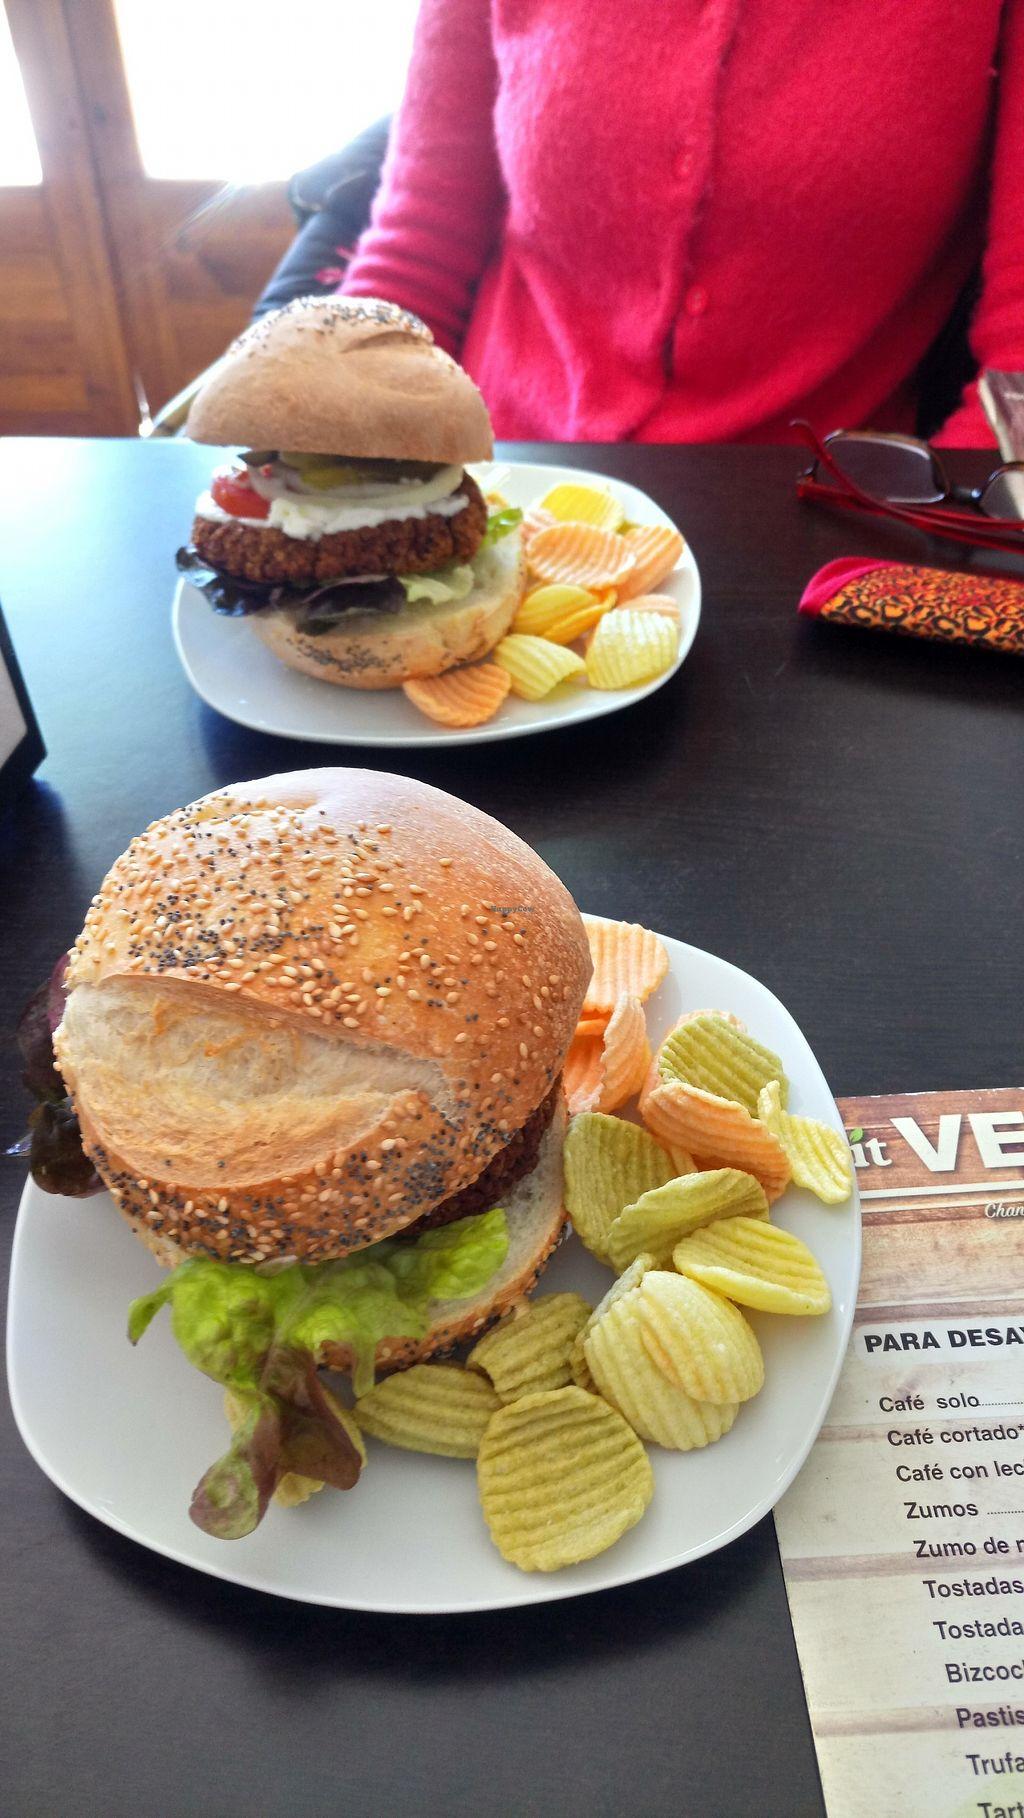 "Photo of Petit Vegan  by <a href=""/members/profile/M.Ellis"">M.Ellis</a> <br/>Big tasty burgers <br/> April 14, 2018  - <a href='/contact/abuse/image/95126/385844'>Report</a>"